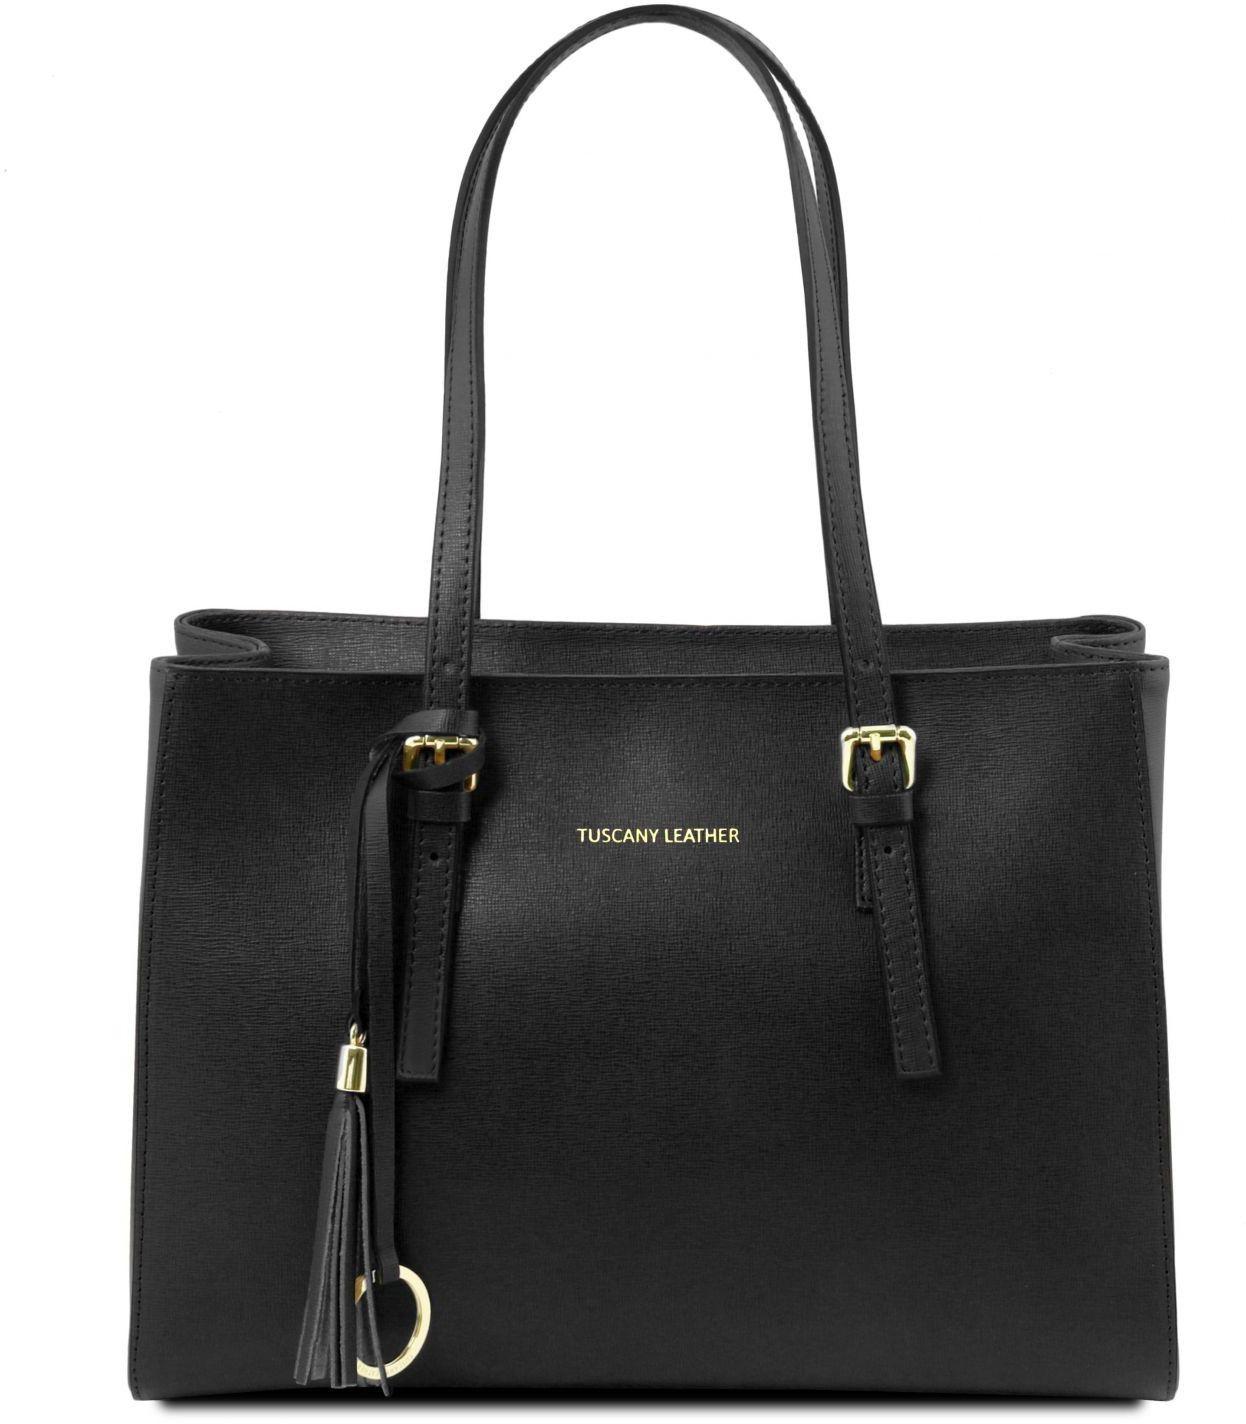 319800ea8a Γυναικεία Τσάντα Δερμάτινη TL141518 Μαύρο Tuscany Leather